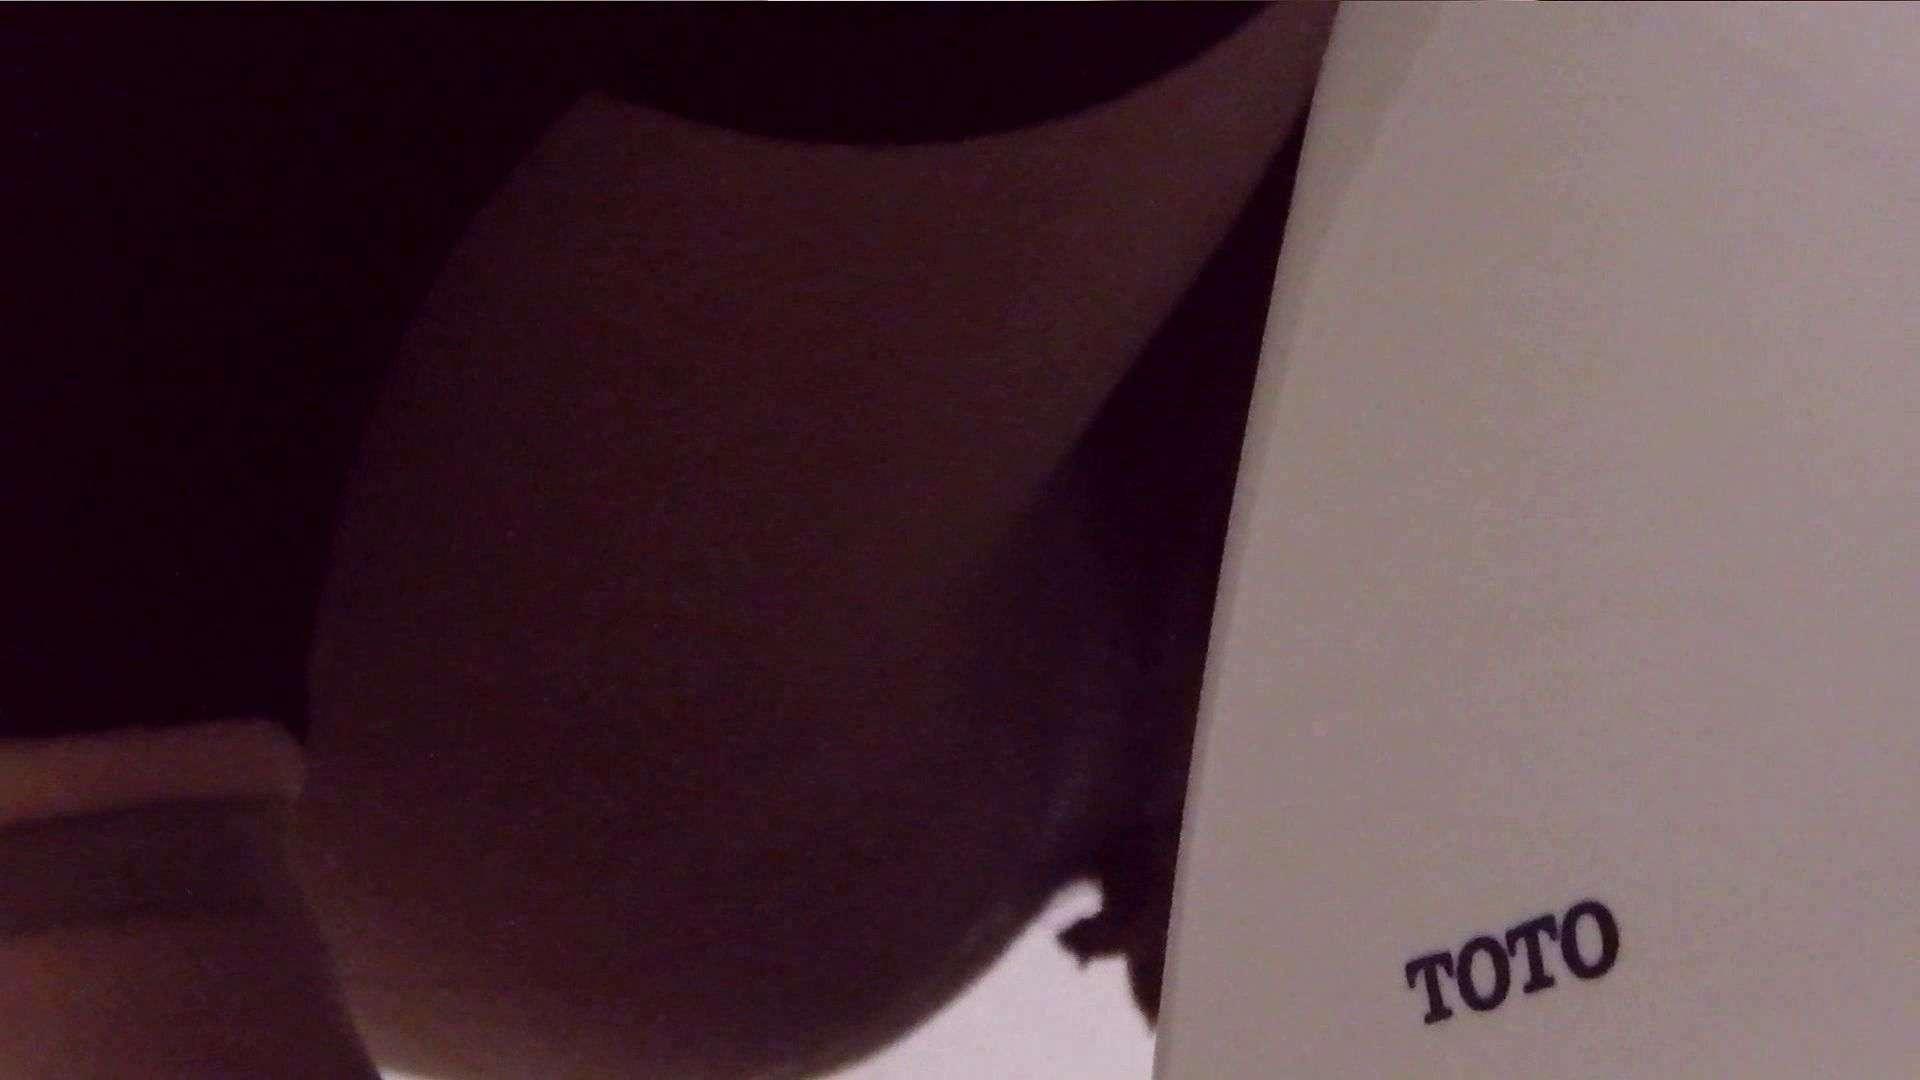 vol.17 命がけ潜伏洗面所! 張り裂けんばかりの大物 プライベート ワレメ無修正動画無料 88pic 87